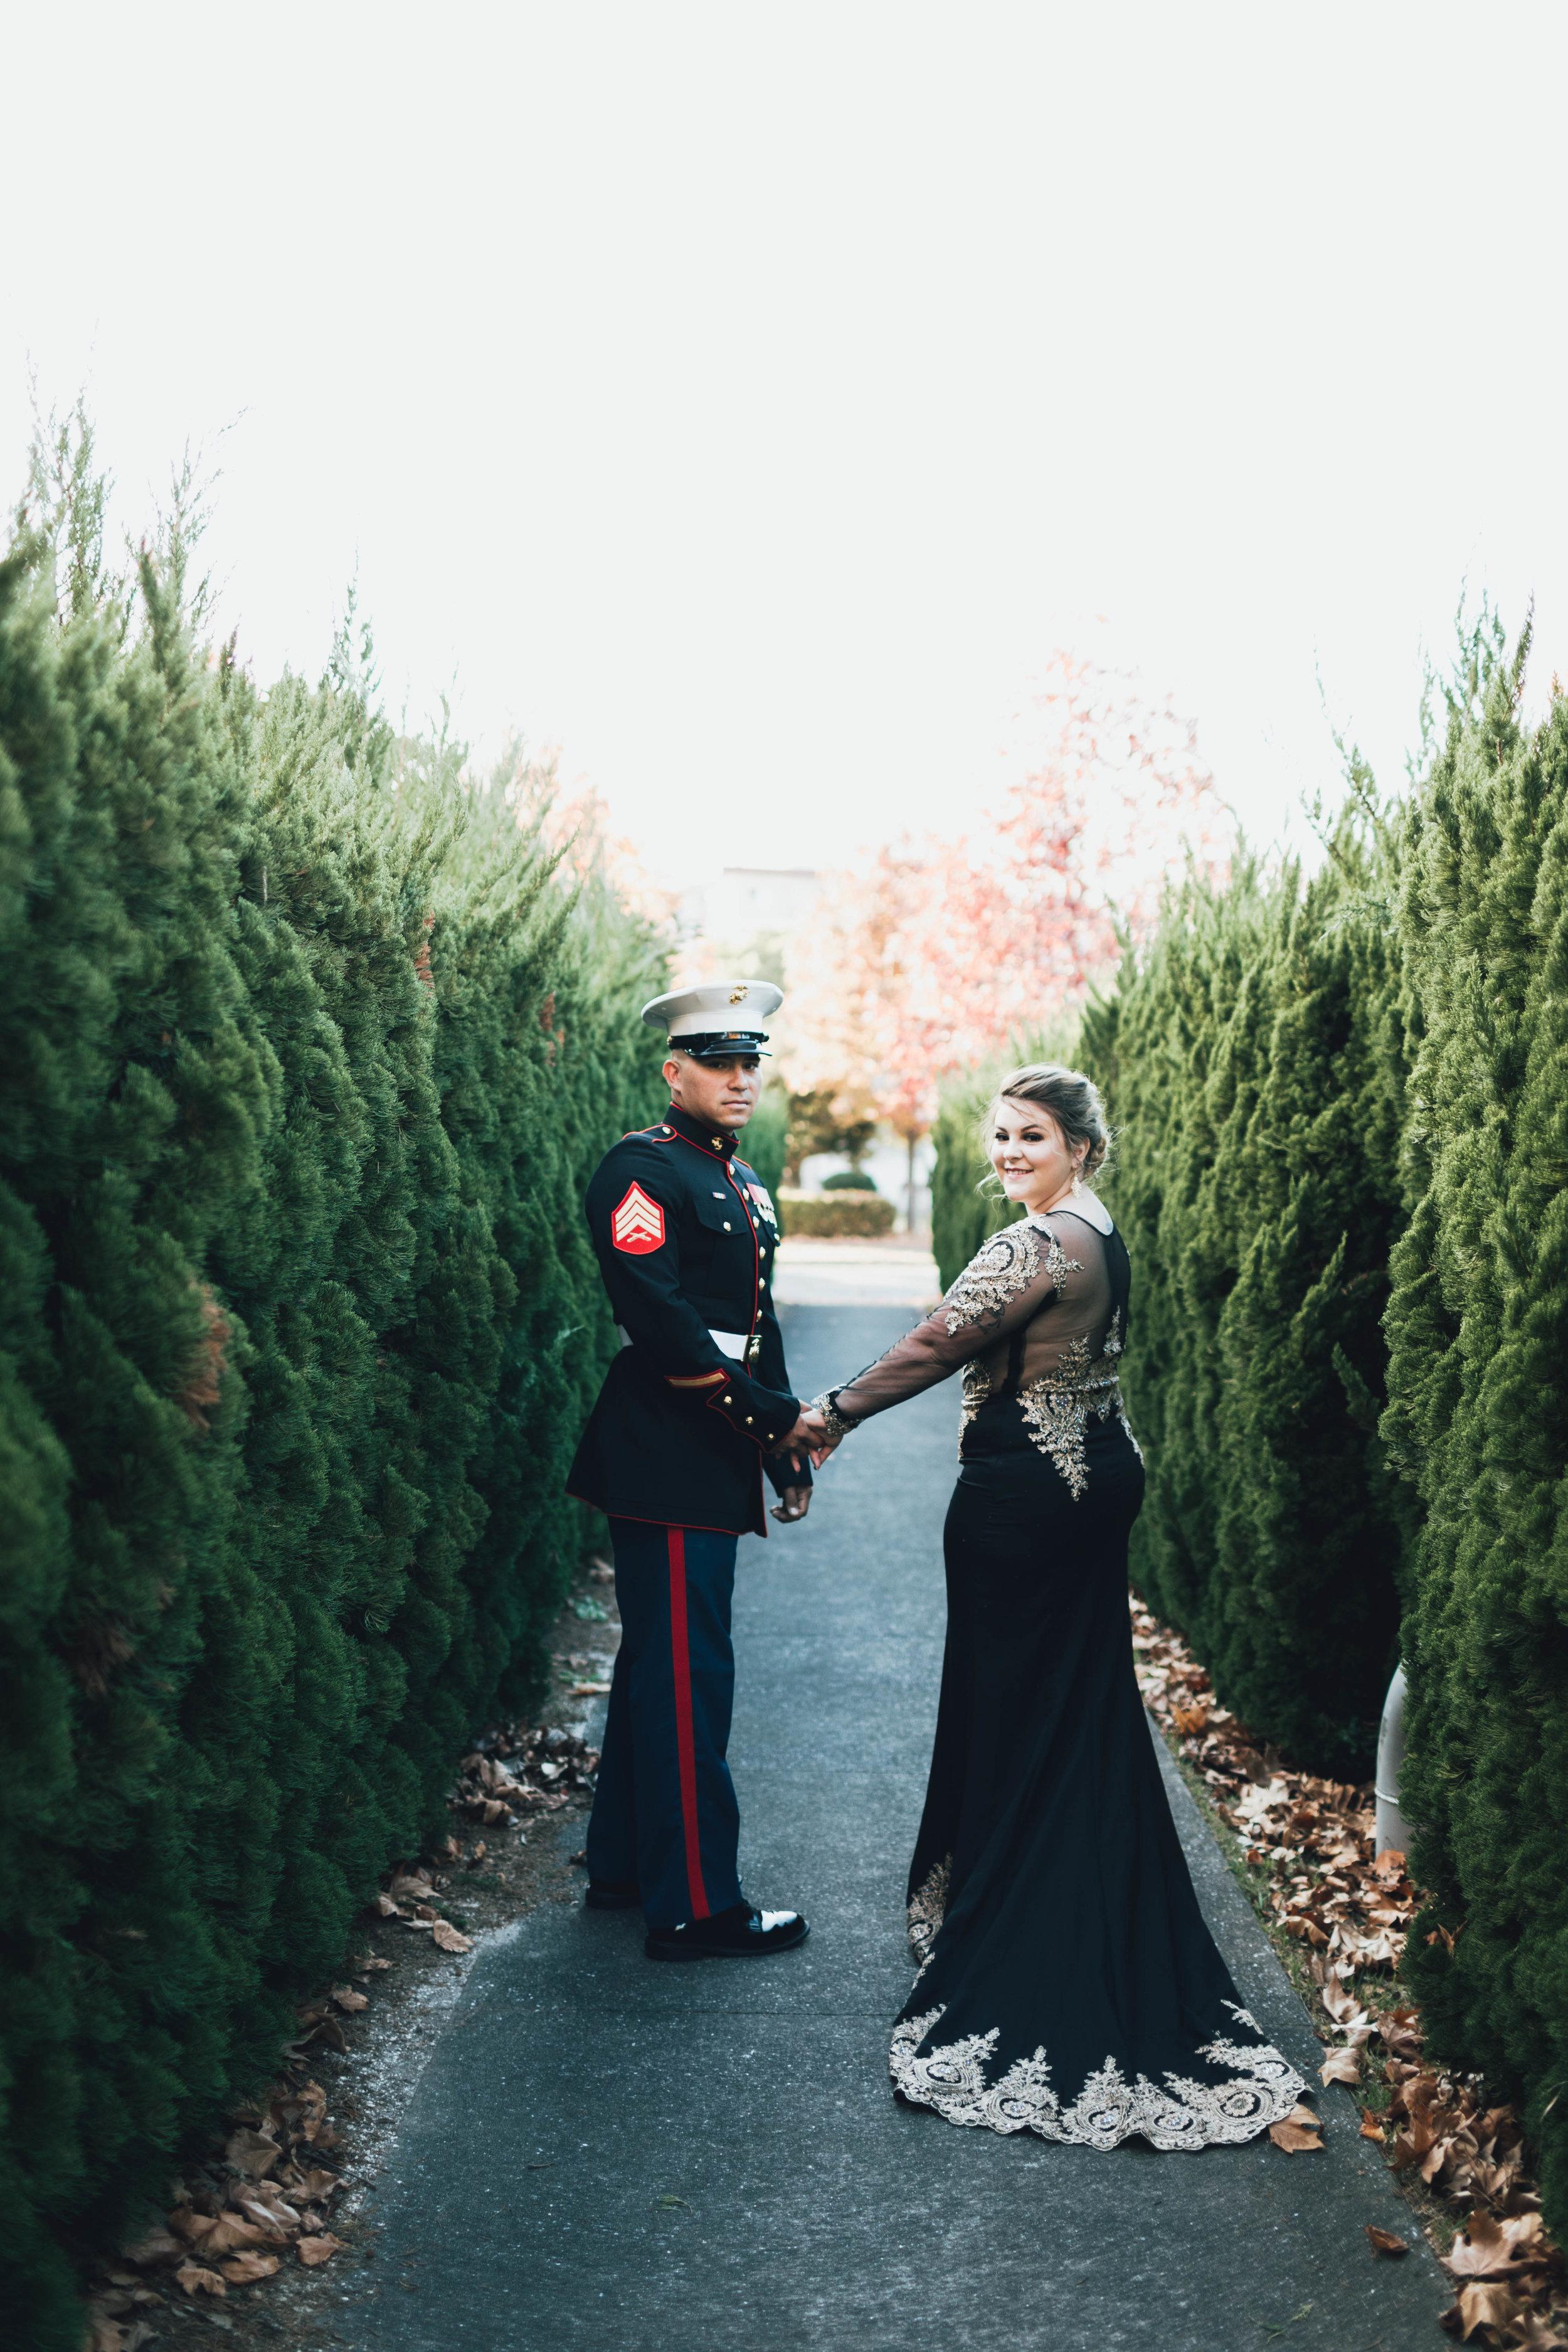 marine-ball-dress-photos-by-samantha-look.jpg